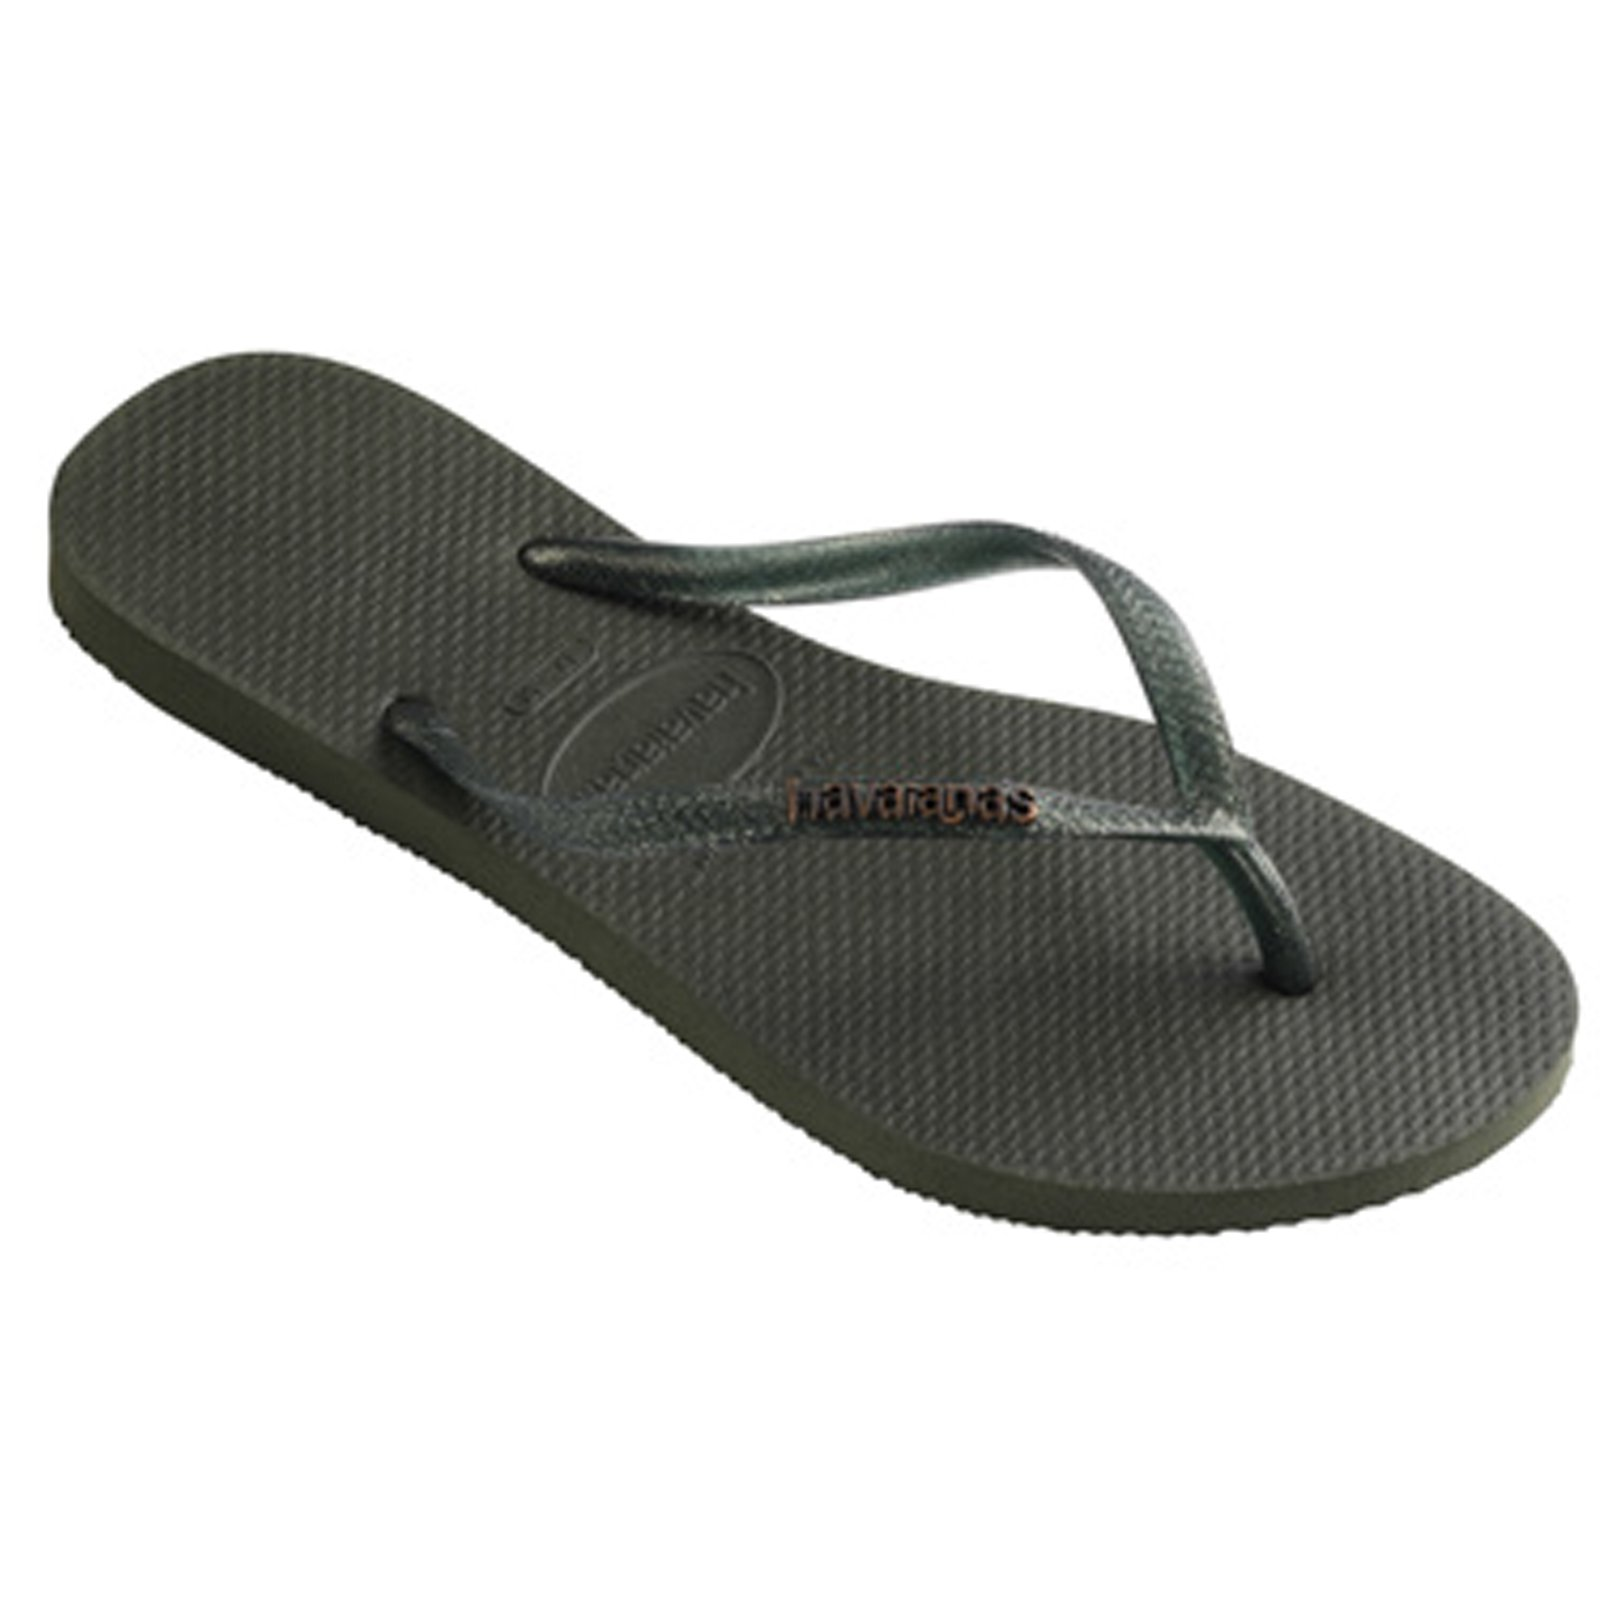 abeccc824342 Flip-Flops Slim Logo Metallic Green Olive - Brand Havaianas